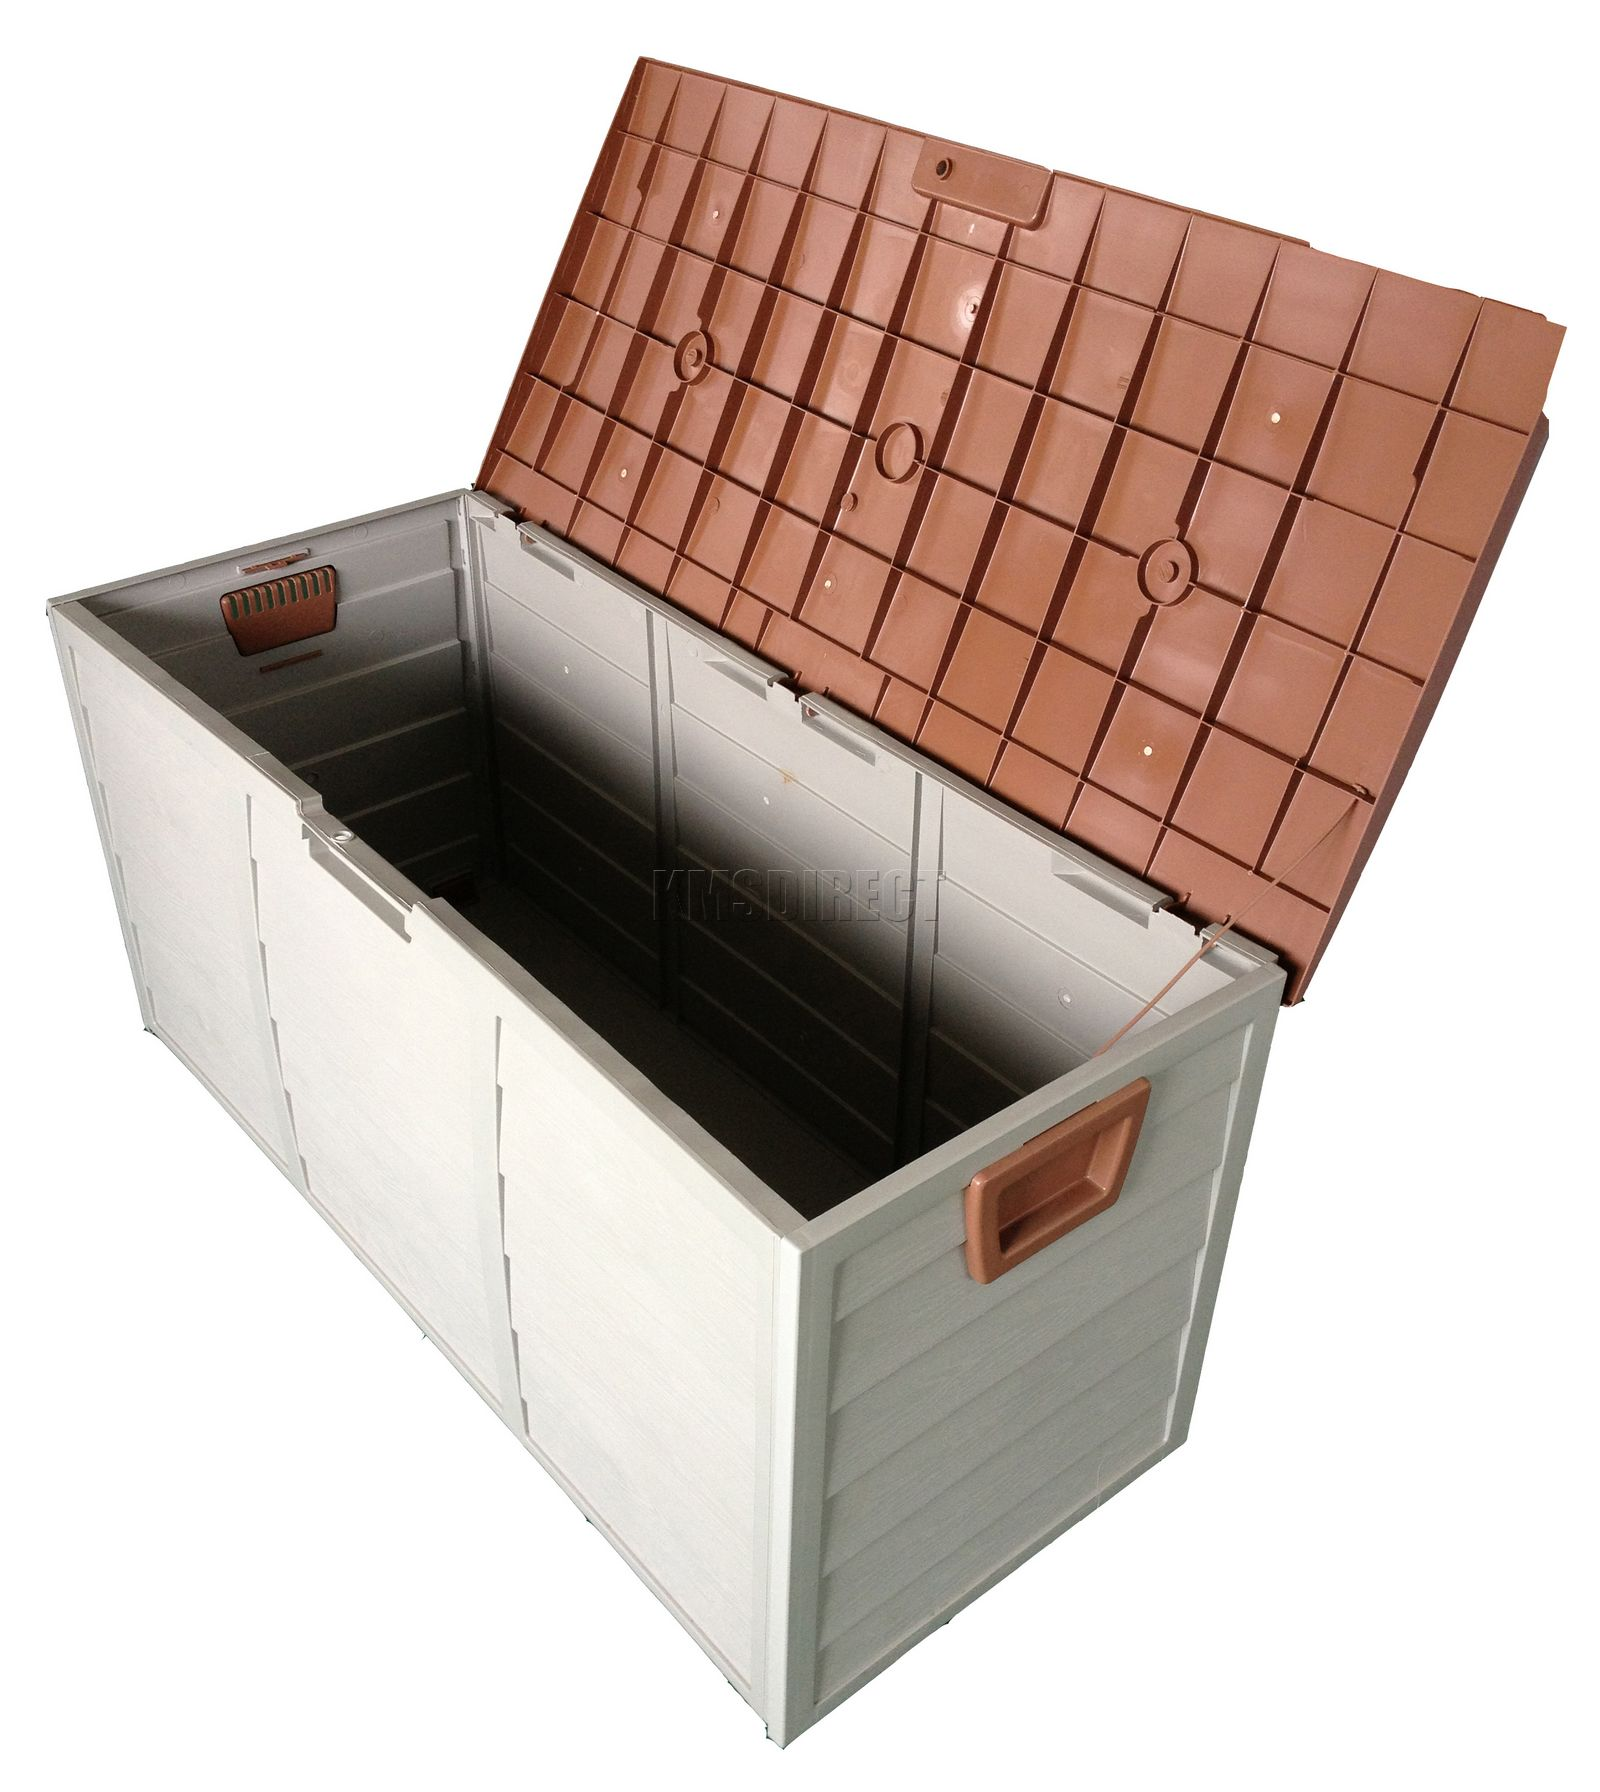 Brown Garden Plastic Storage Utility Chest Shed Box Case